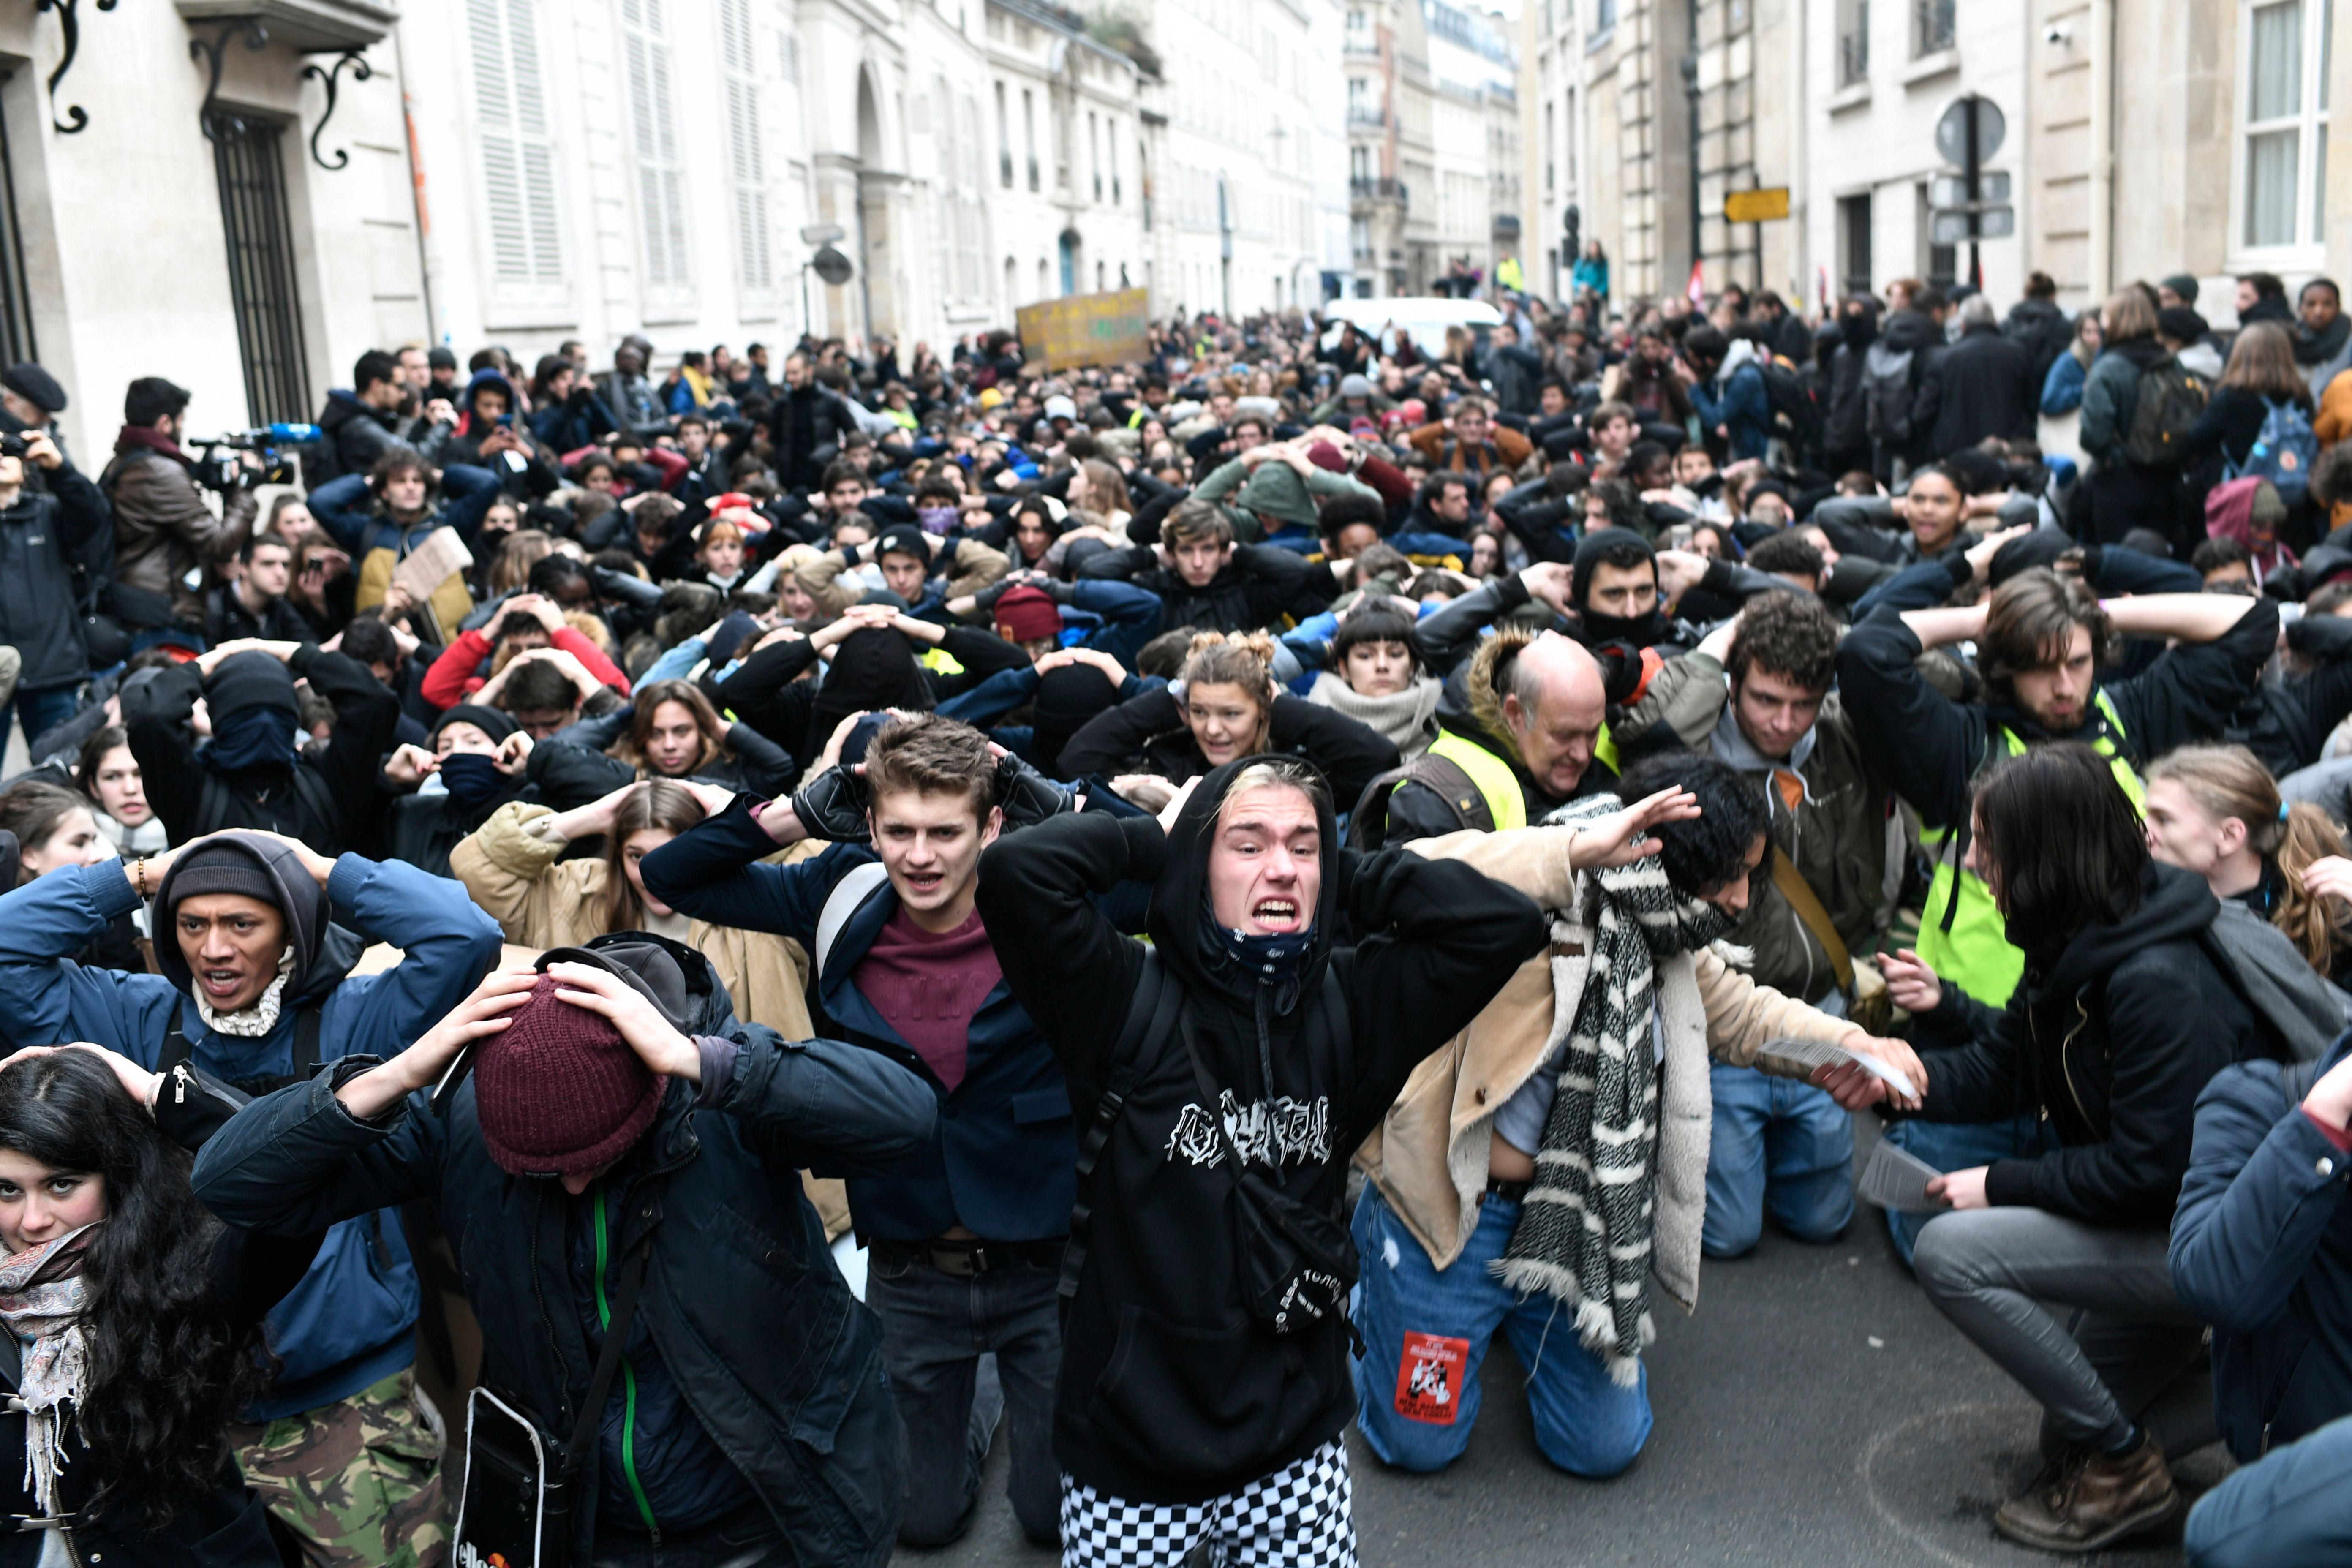 Protest News: Paris Riots Set To Continue As France President Emmanuel